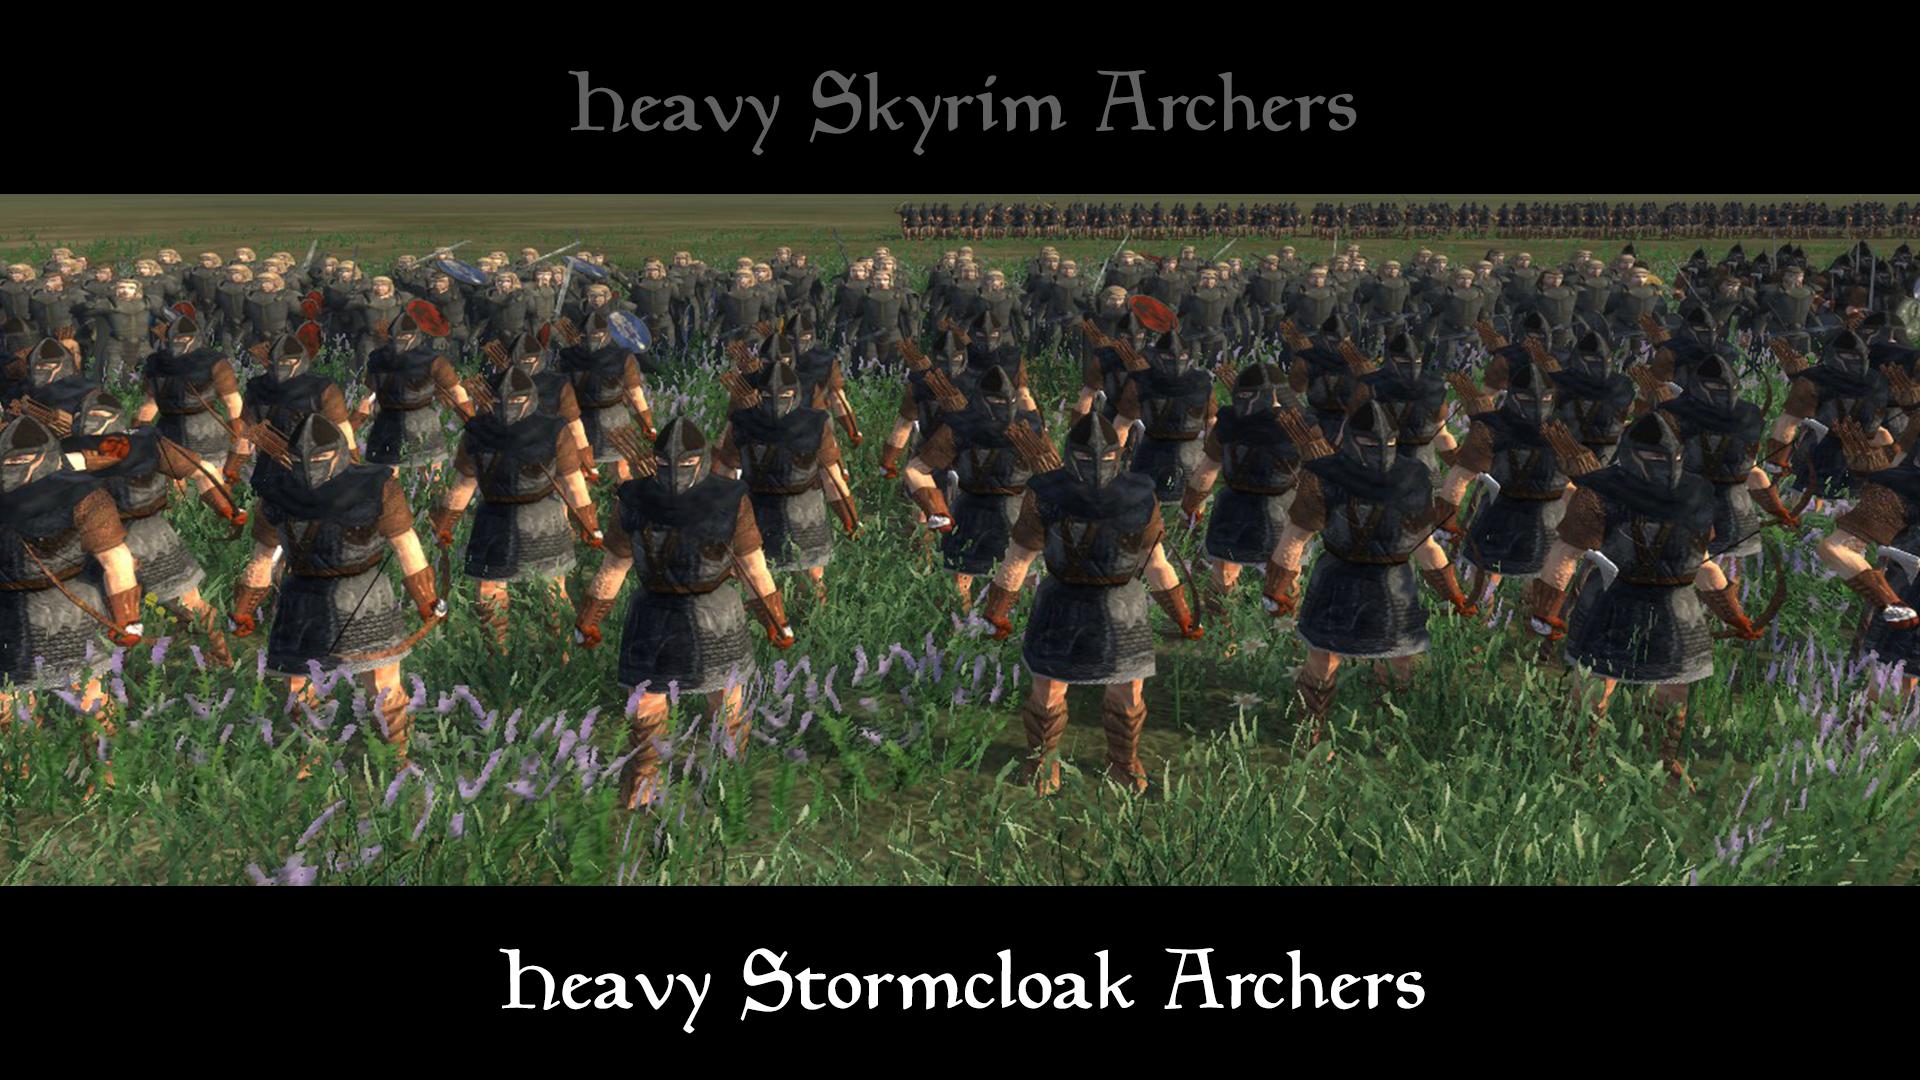 havy stormcloak archers